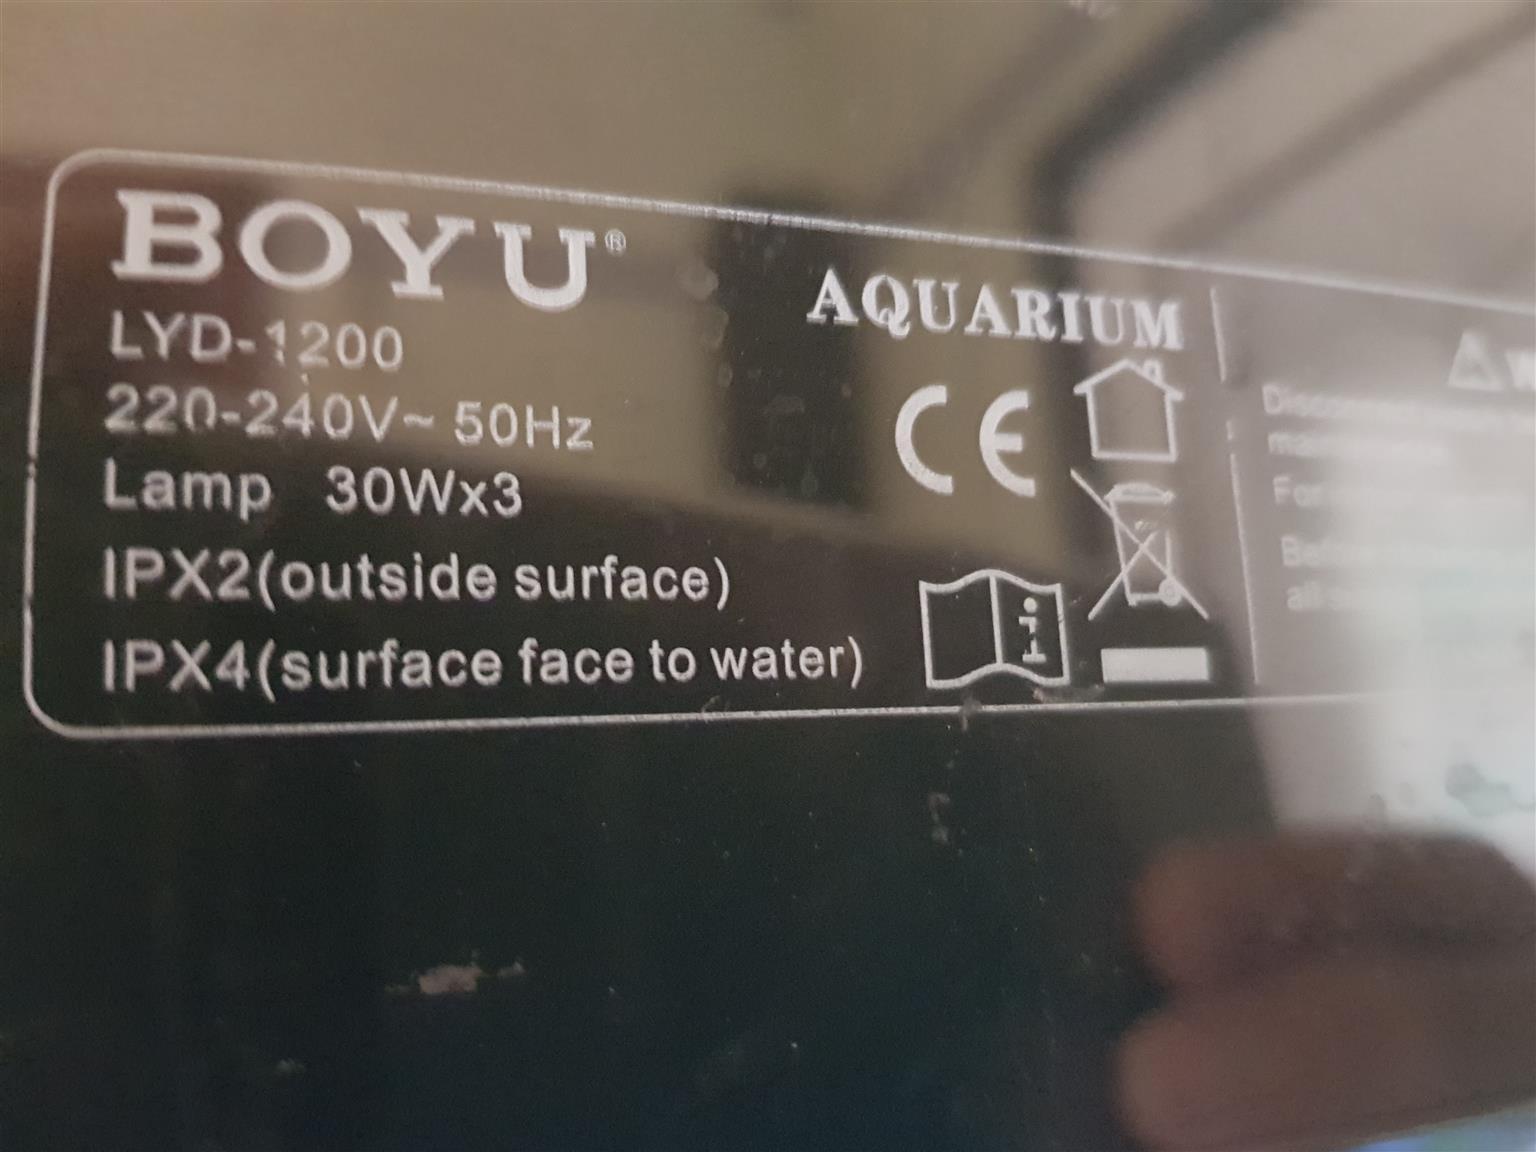 Full freshwater aquarium setup